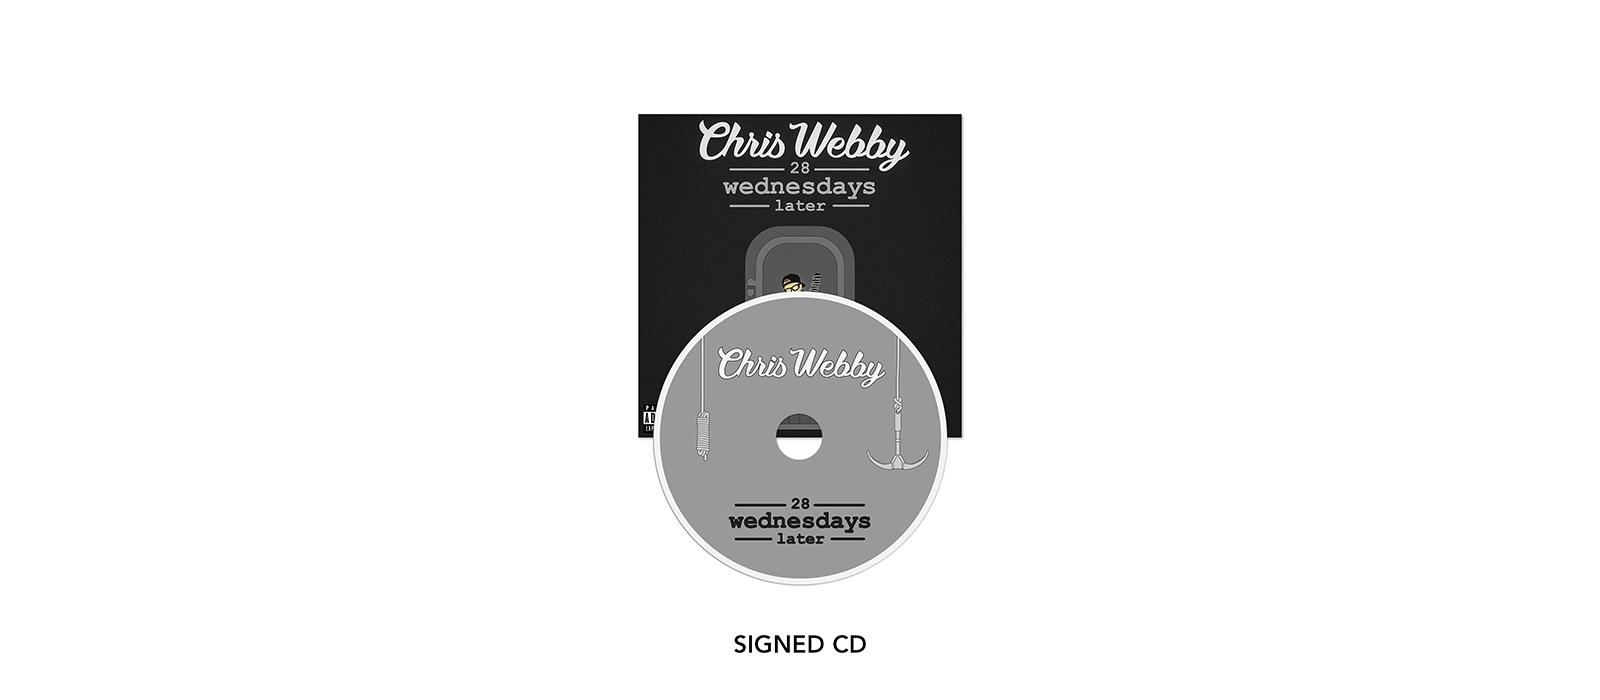 28 Wednesdays Later CD